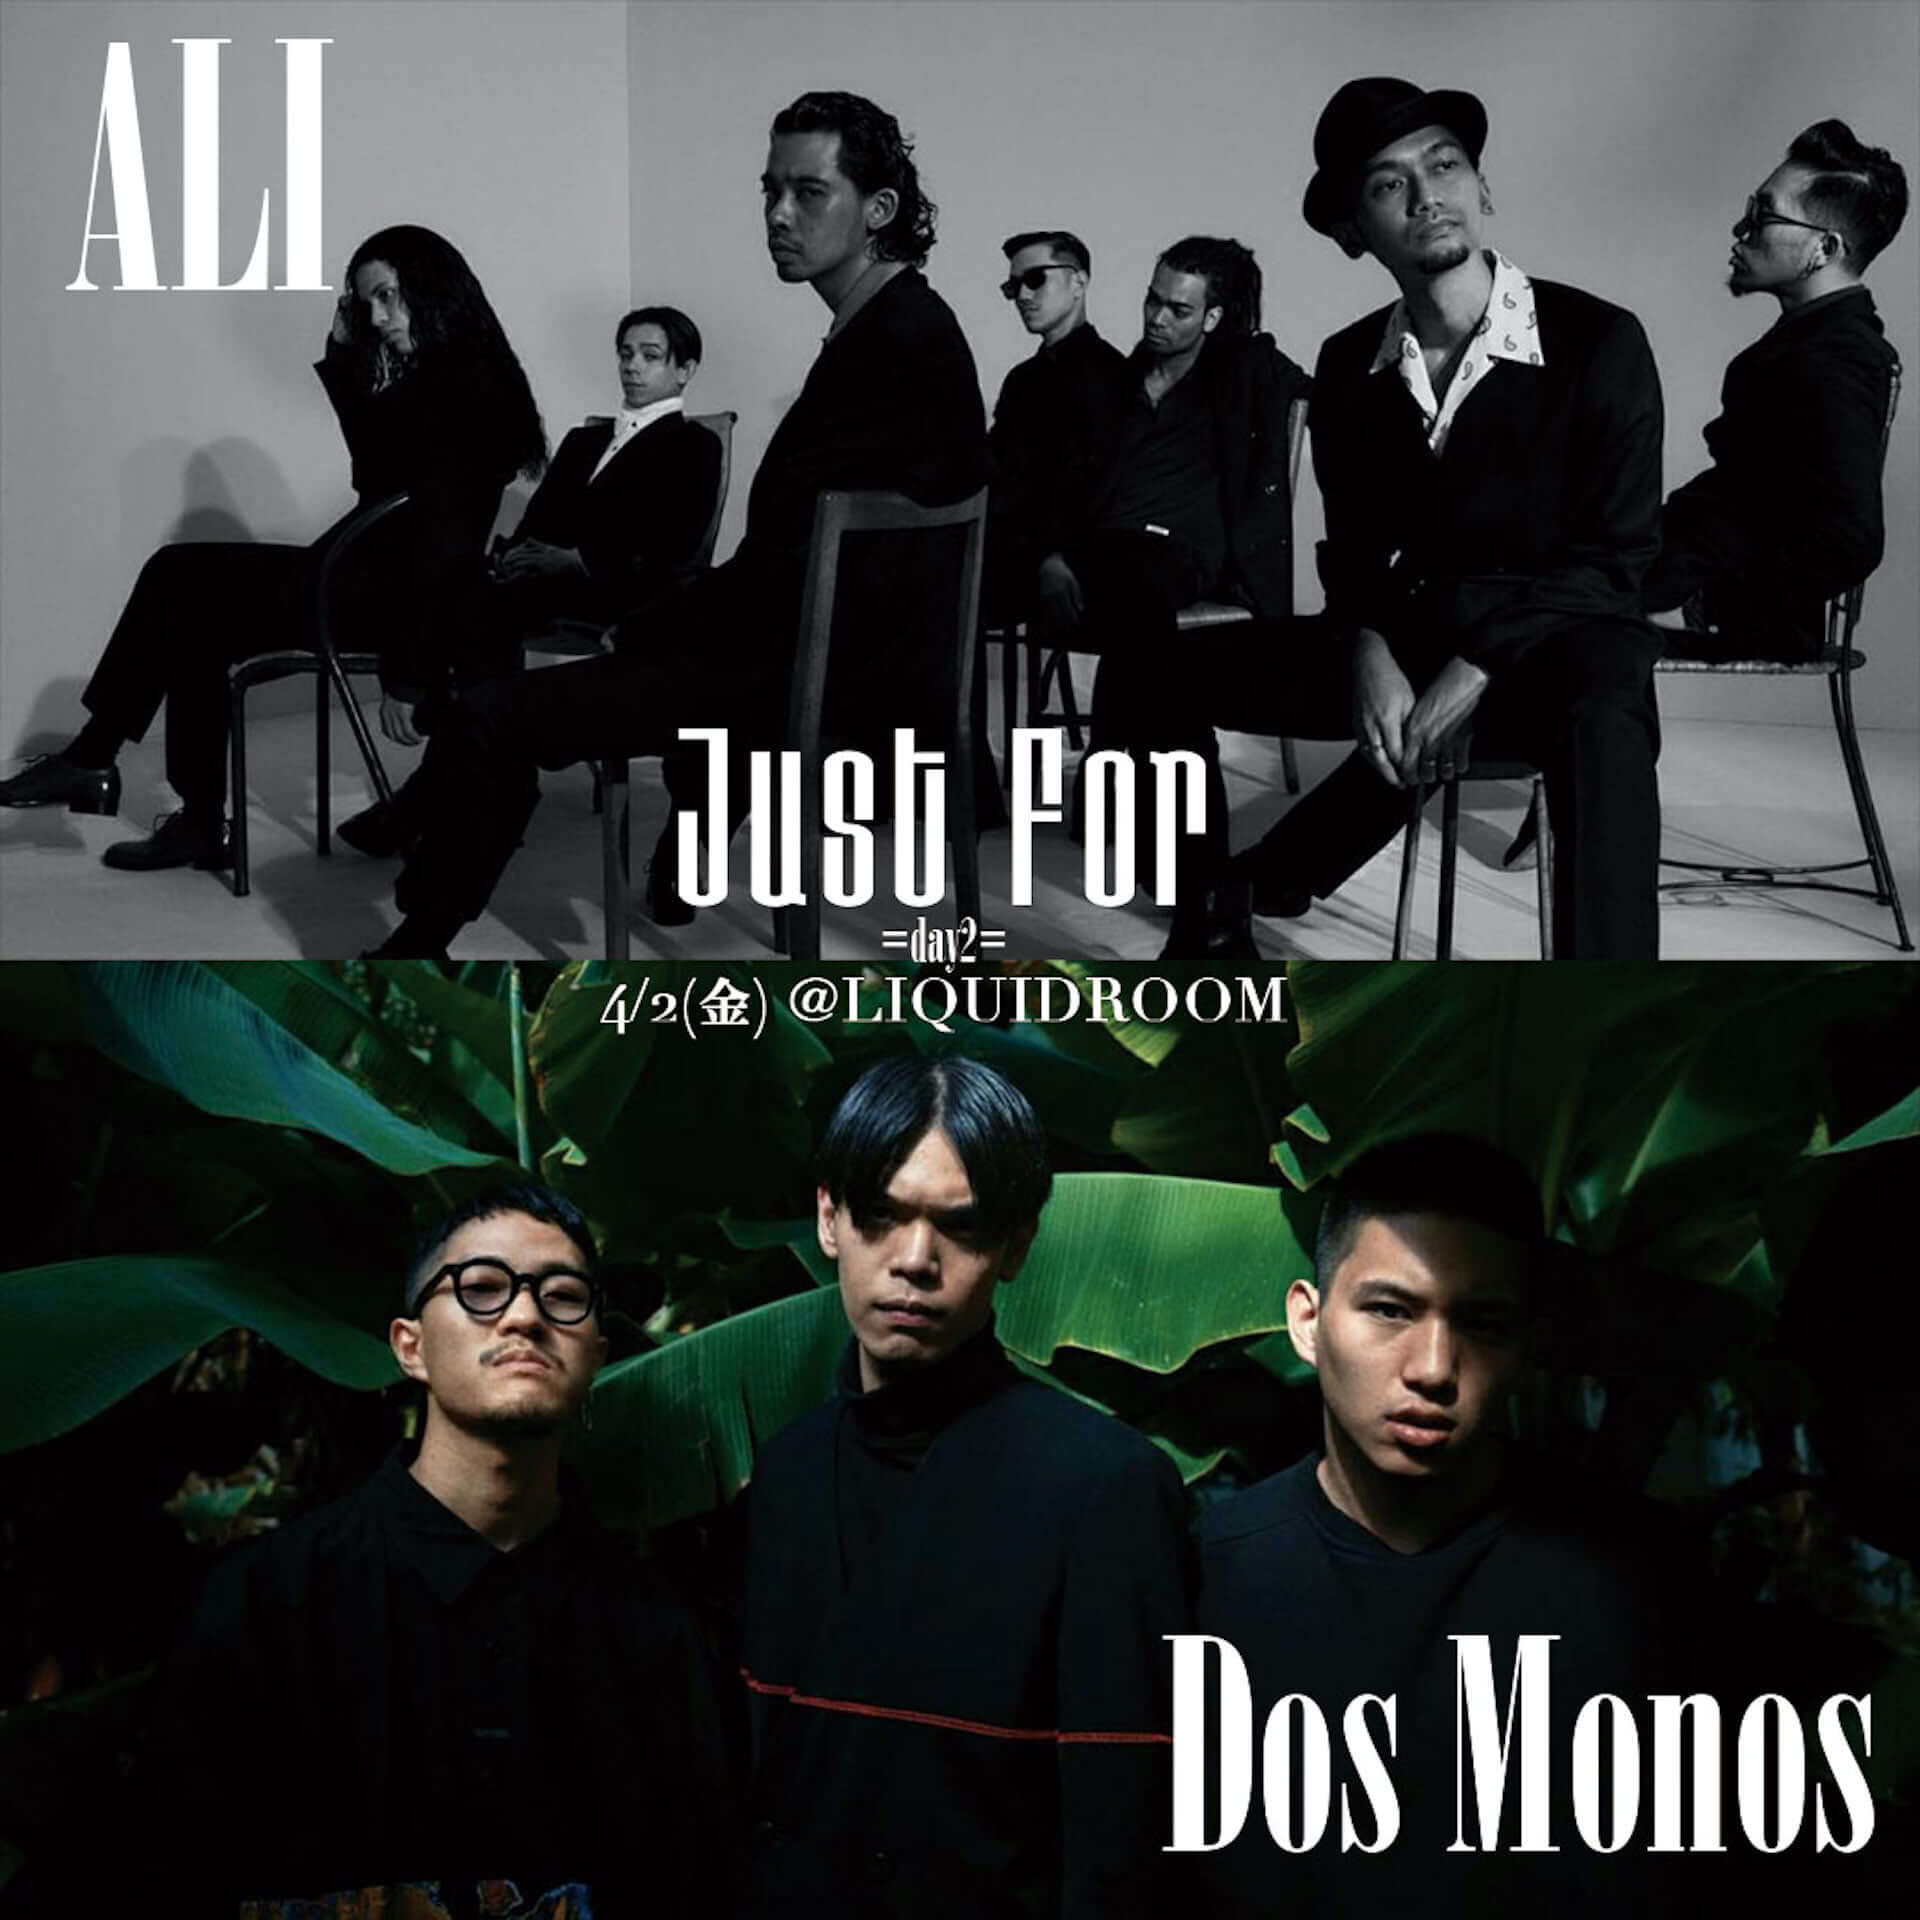 ALI、Dos Monos、vividboooy、B-Lovedが出演!人気イベント<Just For>が恵比寿LIQUIDROOMにて開催決定 music210305_justfor_3-1920x1920